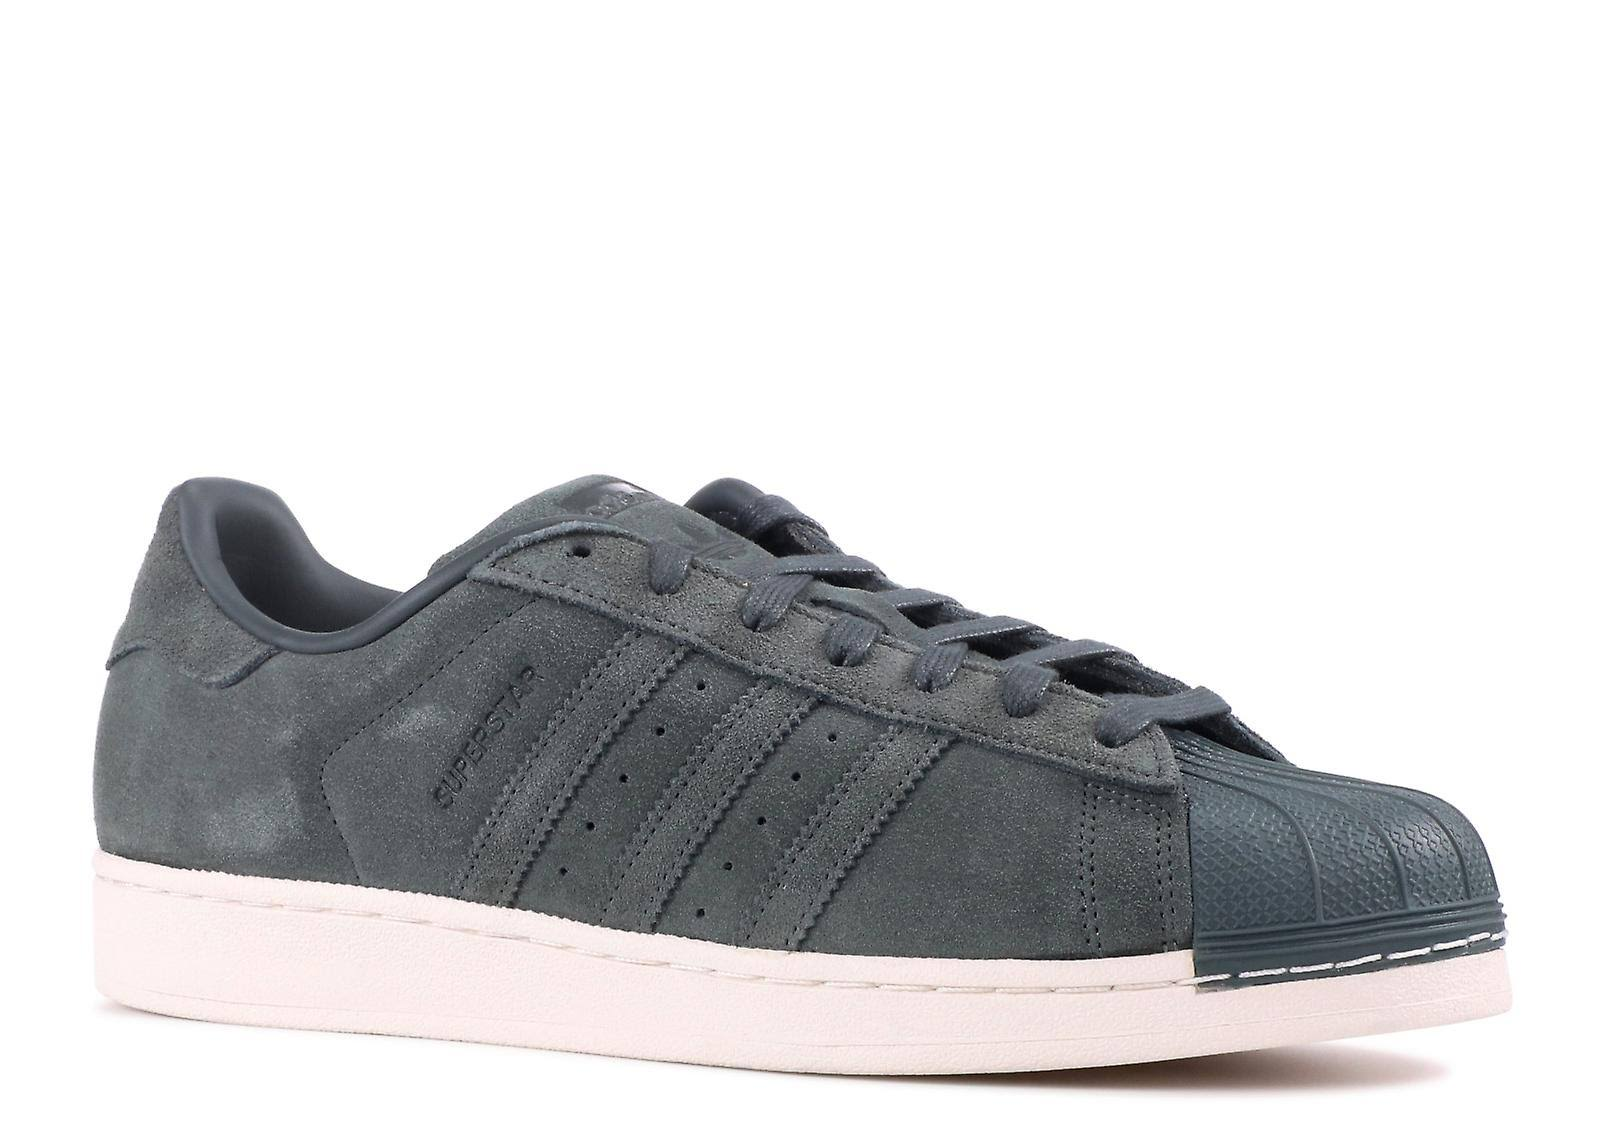 Adidas Superstar - Bz0200 - Shoes 7.5 UK